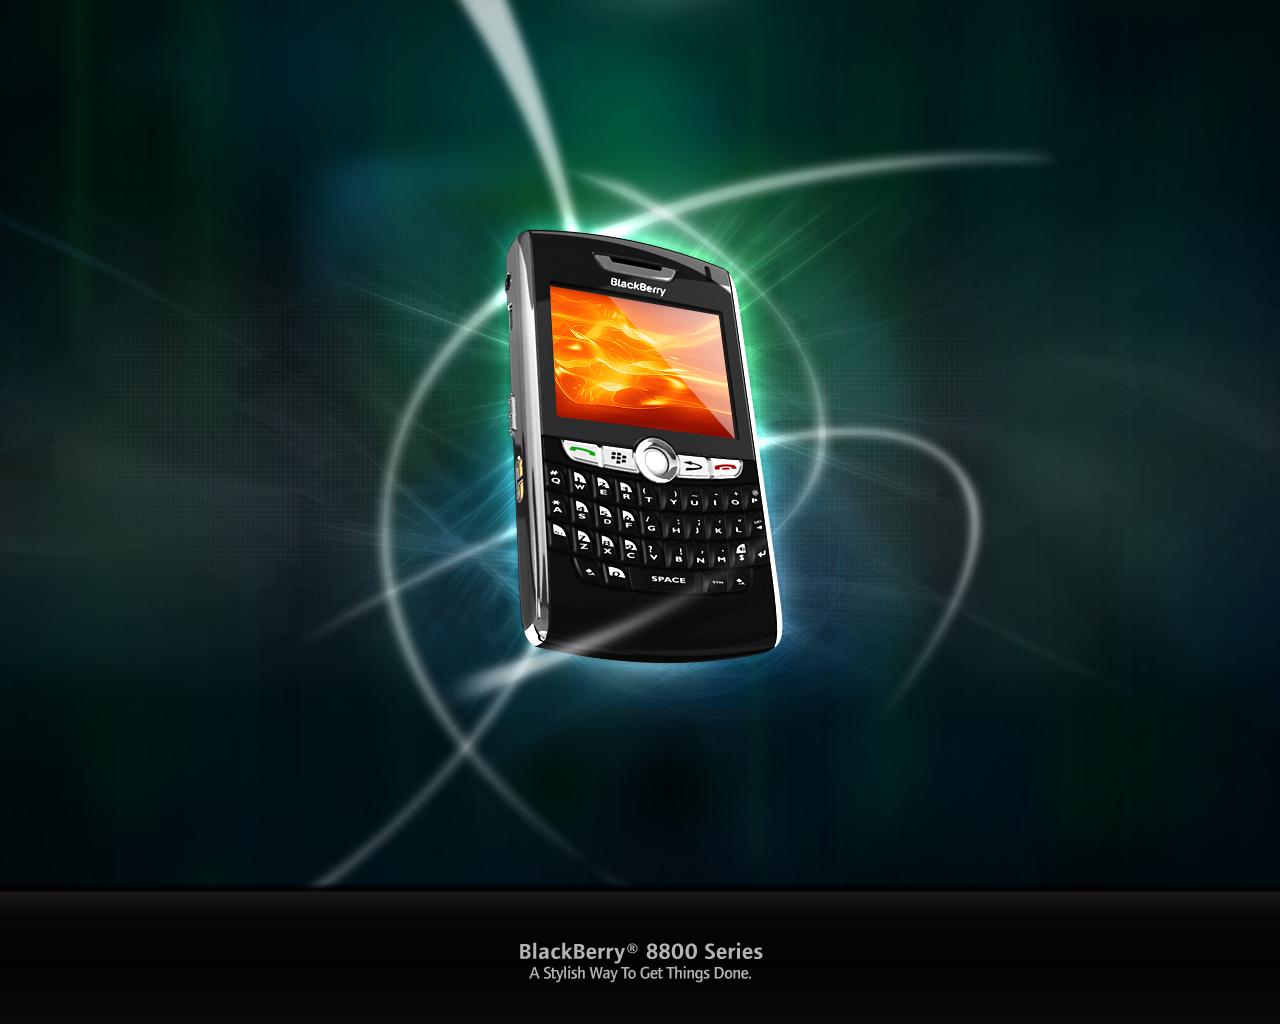 http://3.bp.blogspot.com/-0CxB-wI6z1g/TleDA9seaWI/AAAAAAAACIs/MIWpG8i1ty0/s1600/Blackberry-Wallpapers-2.jpg